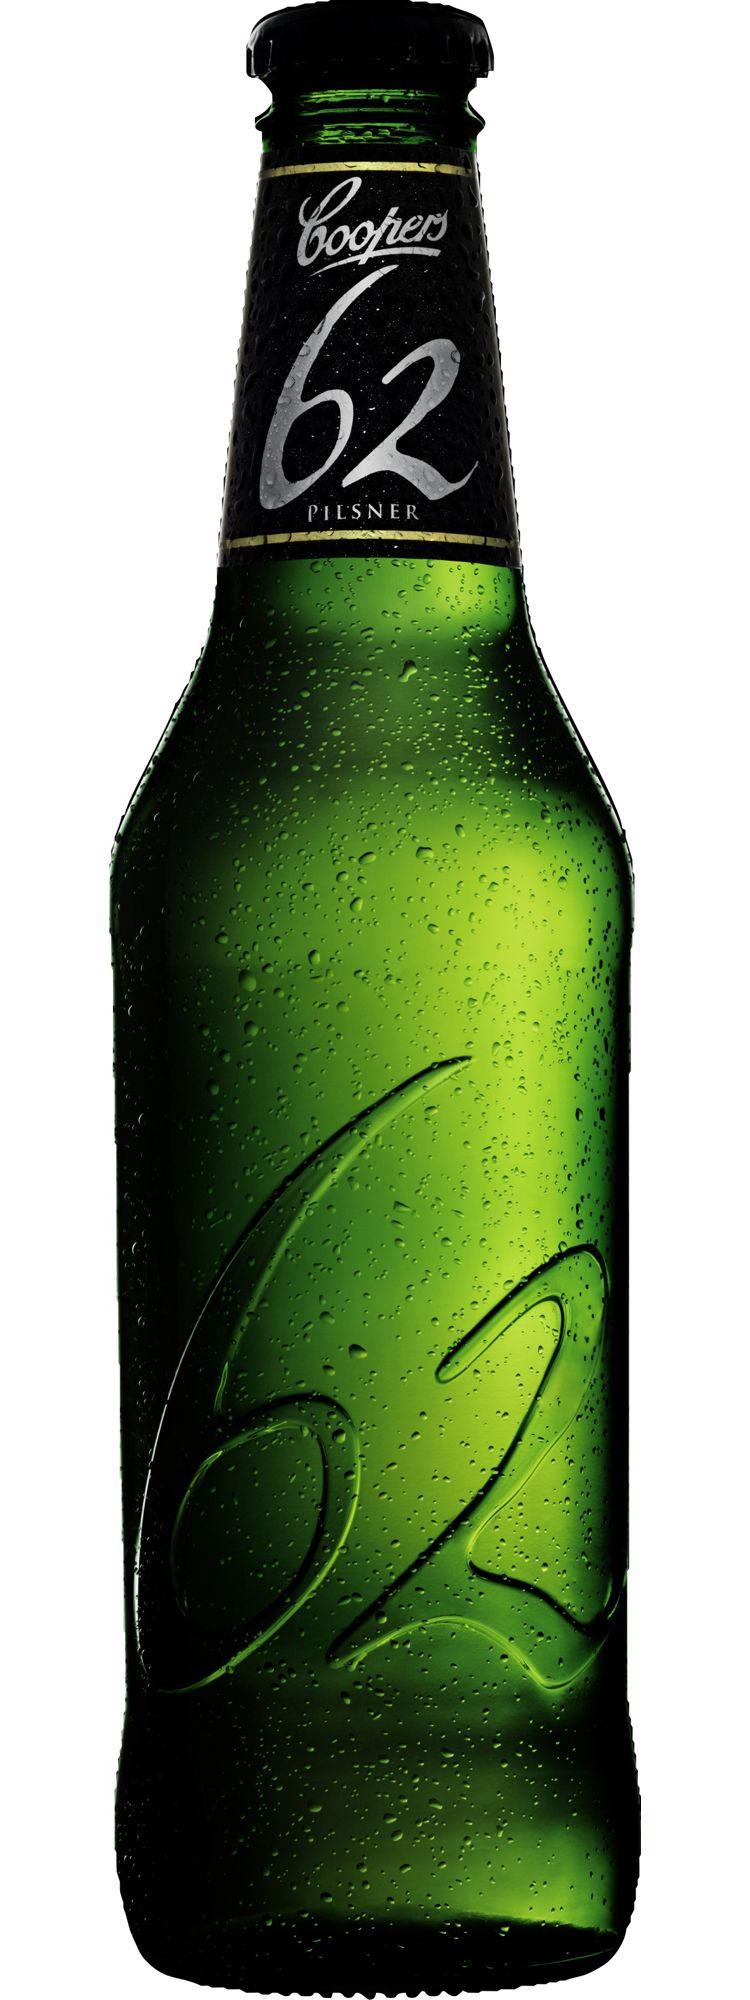 23++ Low carb craft beer australia information